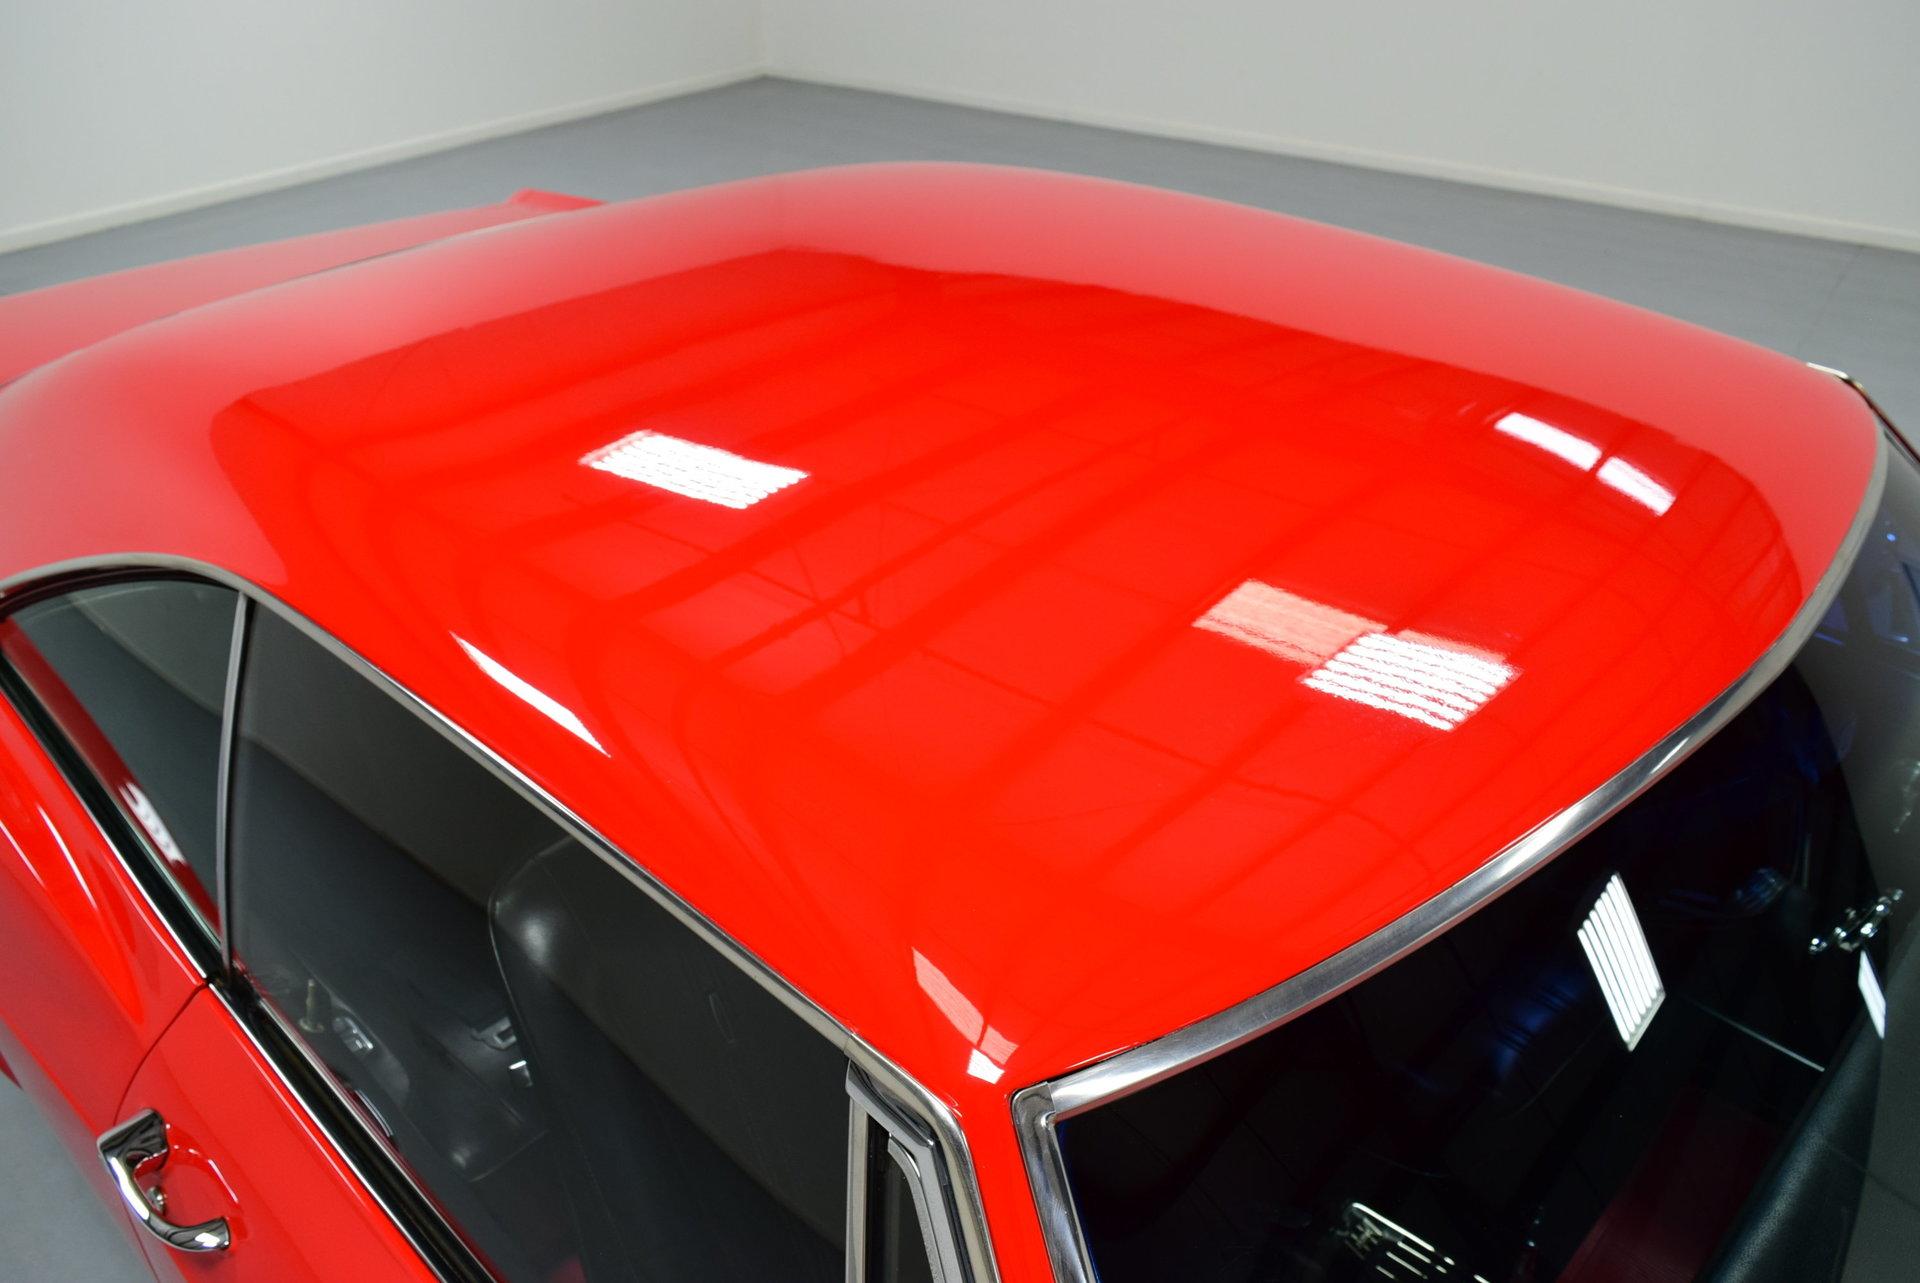 1966 Chevrolet Impala Shelton Classics Performance Chevy 2 Door